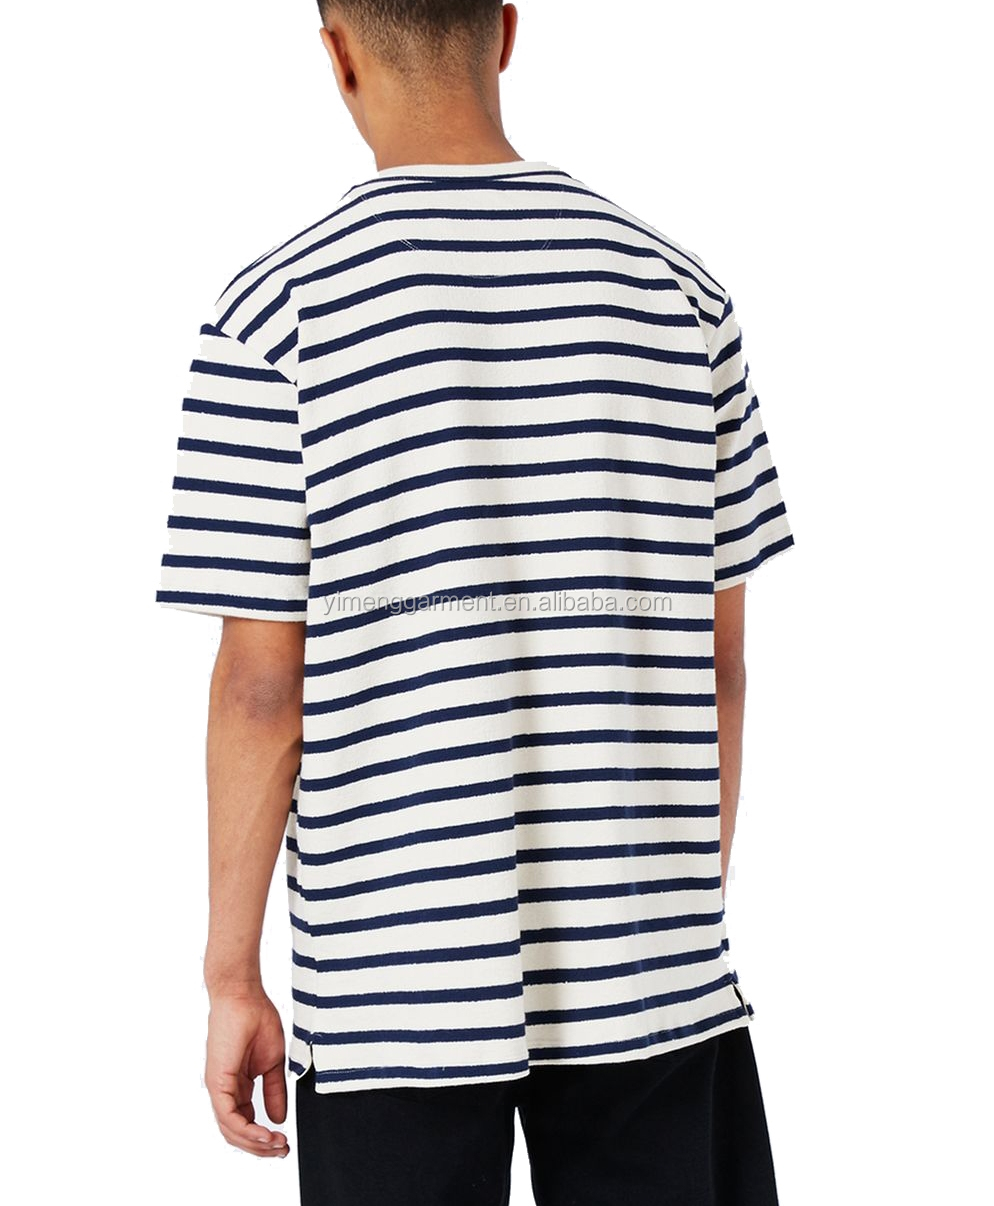 Korean Street Fashion Short Sleeve Cotton Men T Shirt In White And